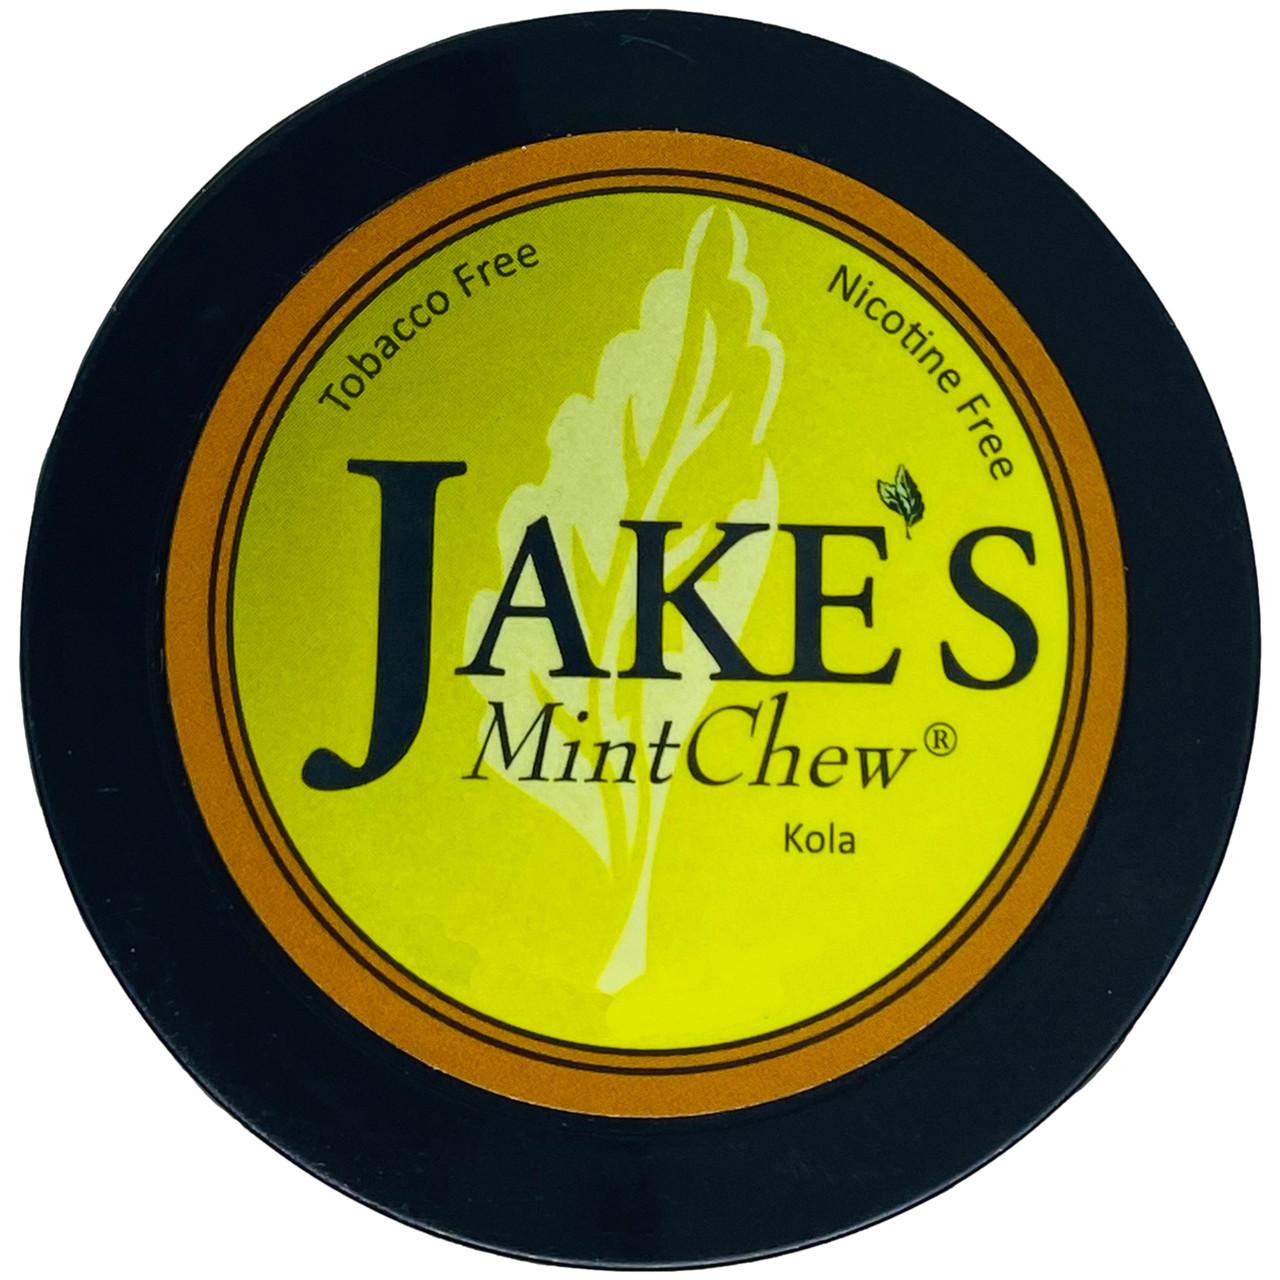 Jake's Mint Chew Kola 1 Can